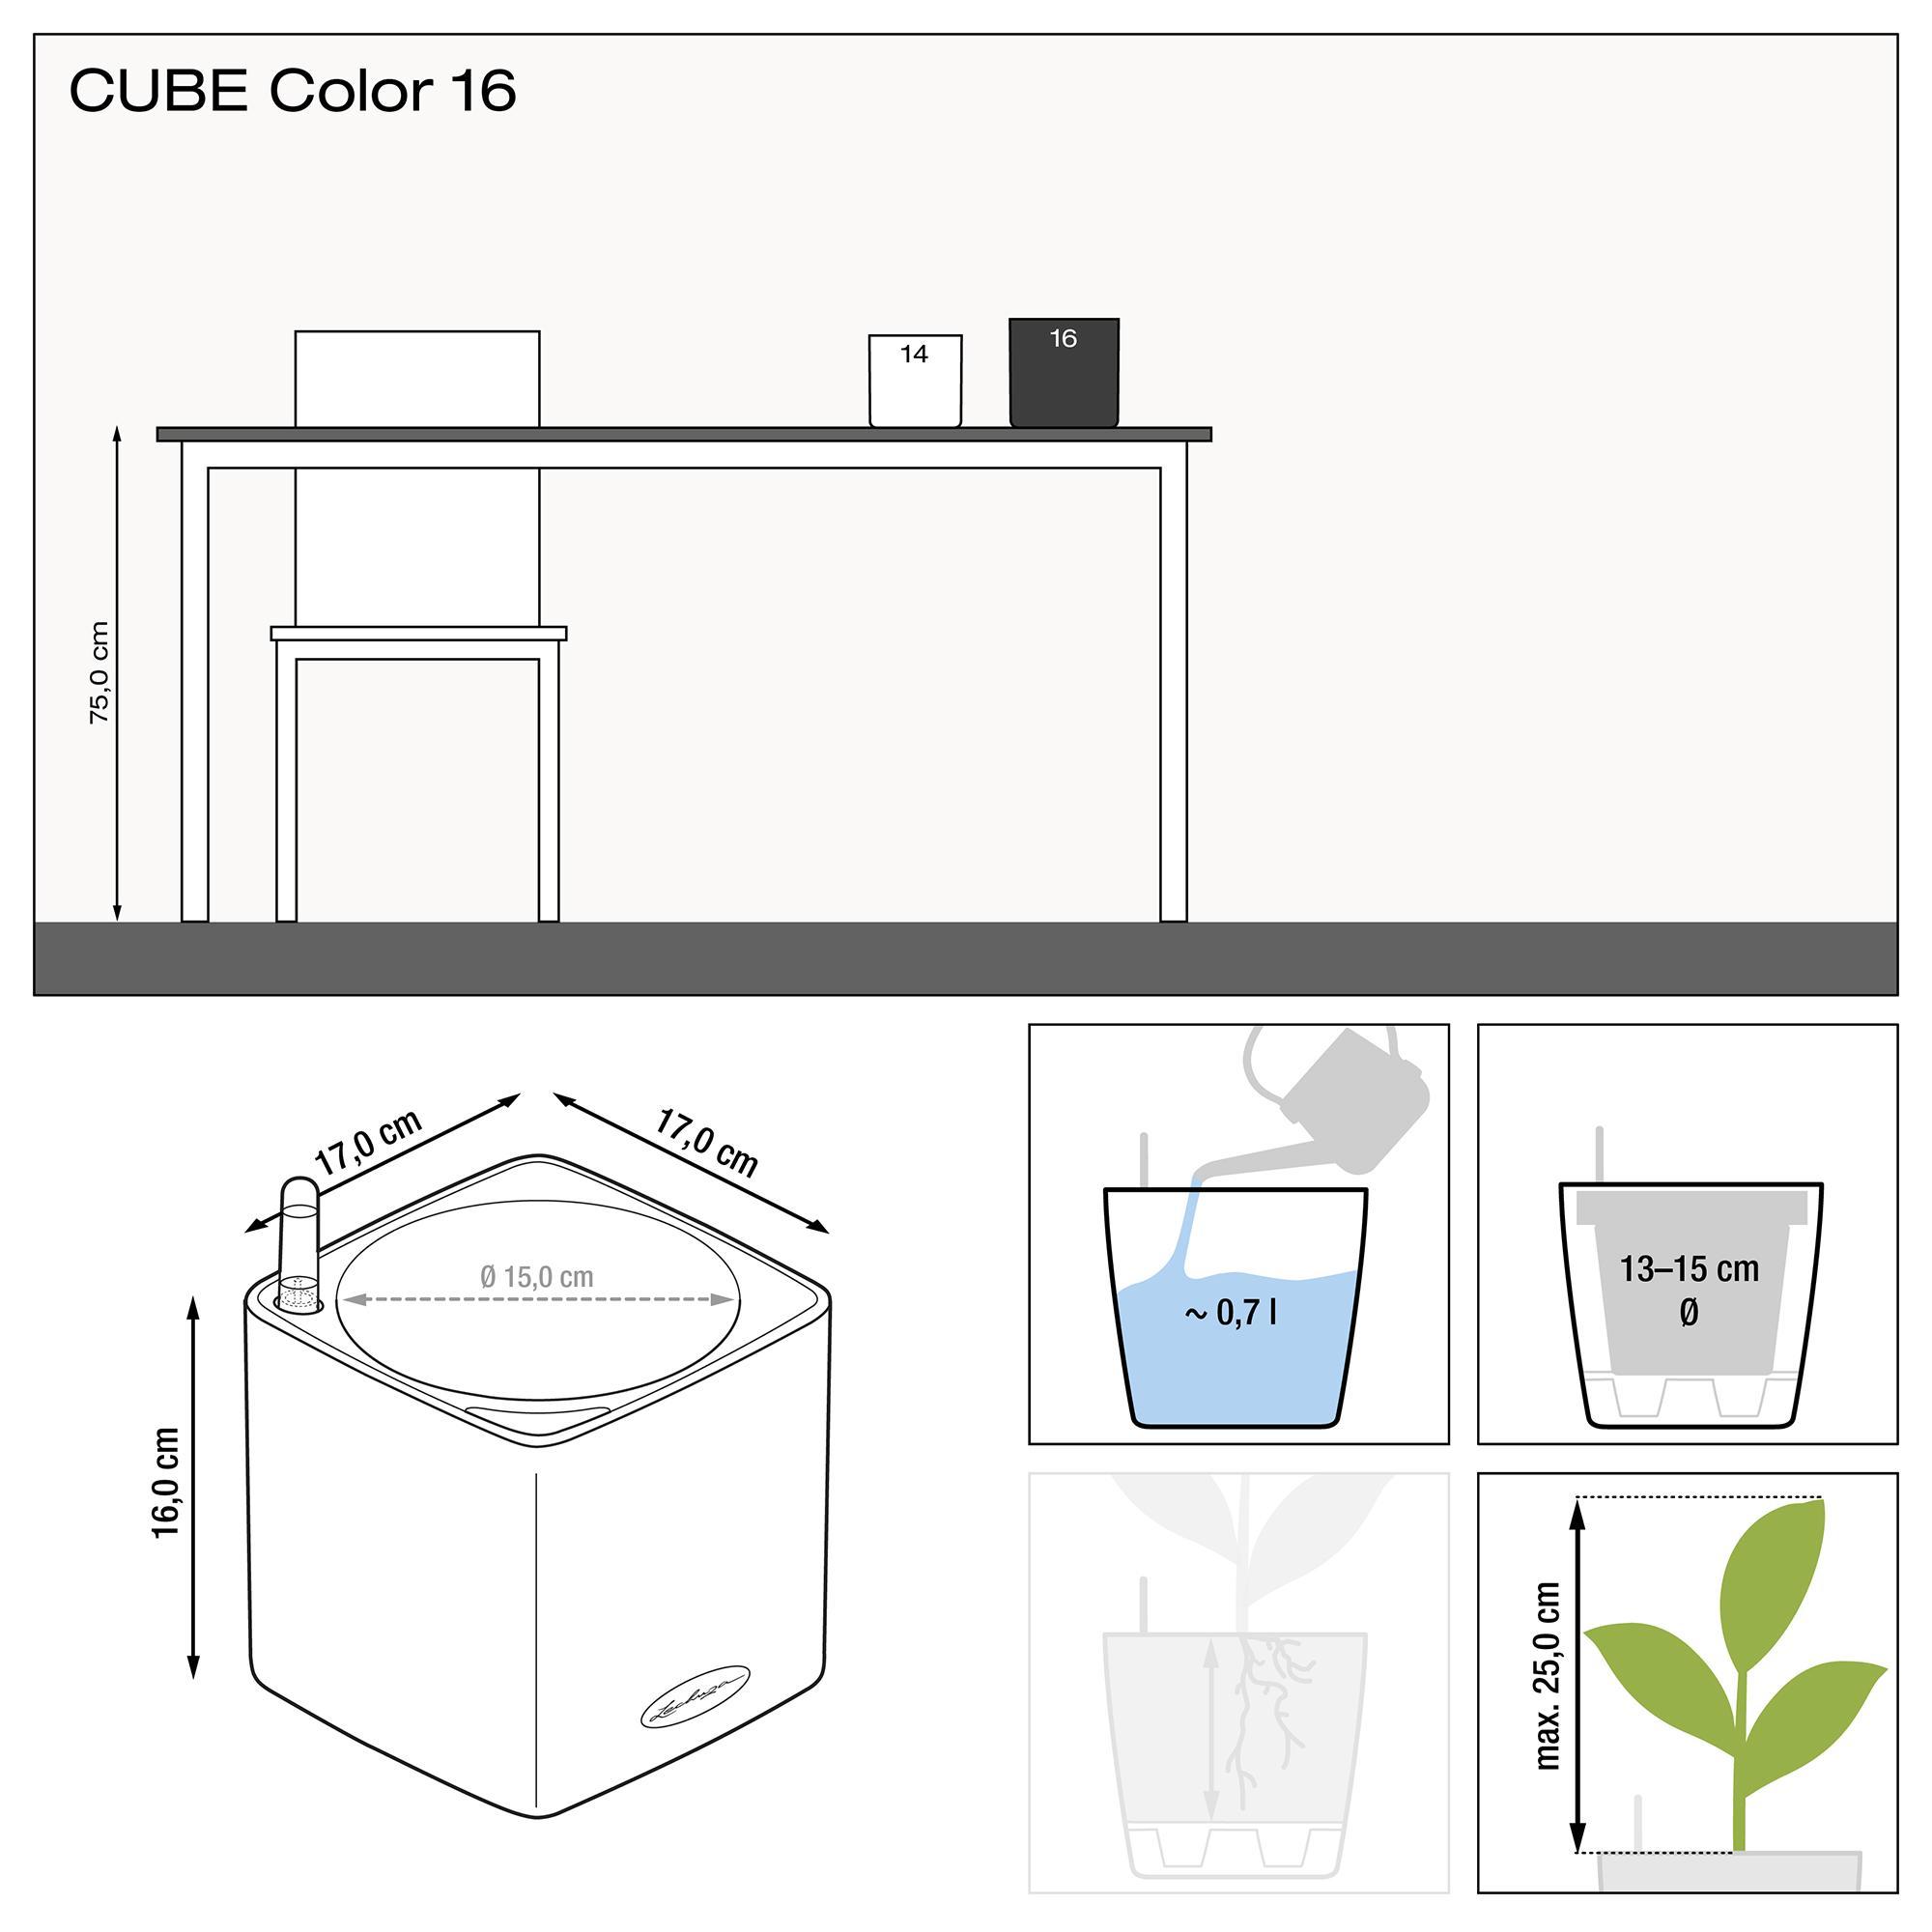 le_cube-color16_product_addi_nz